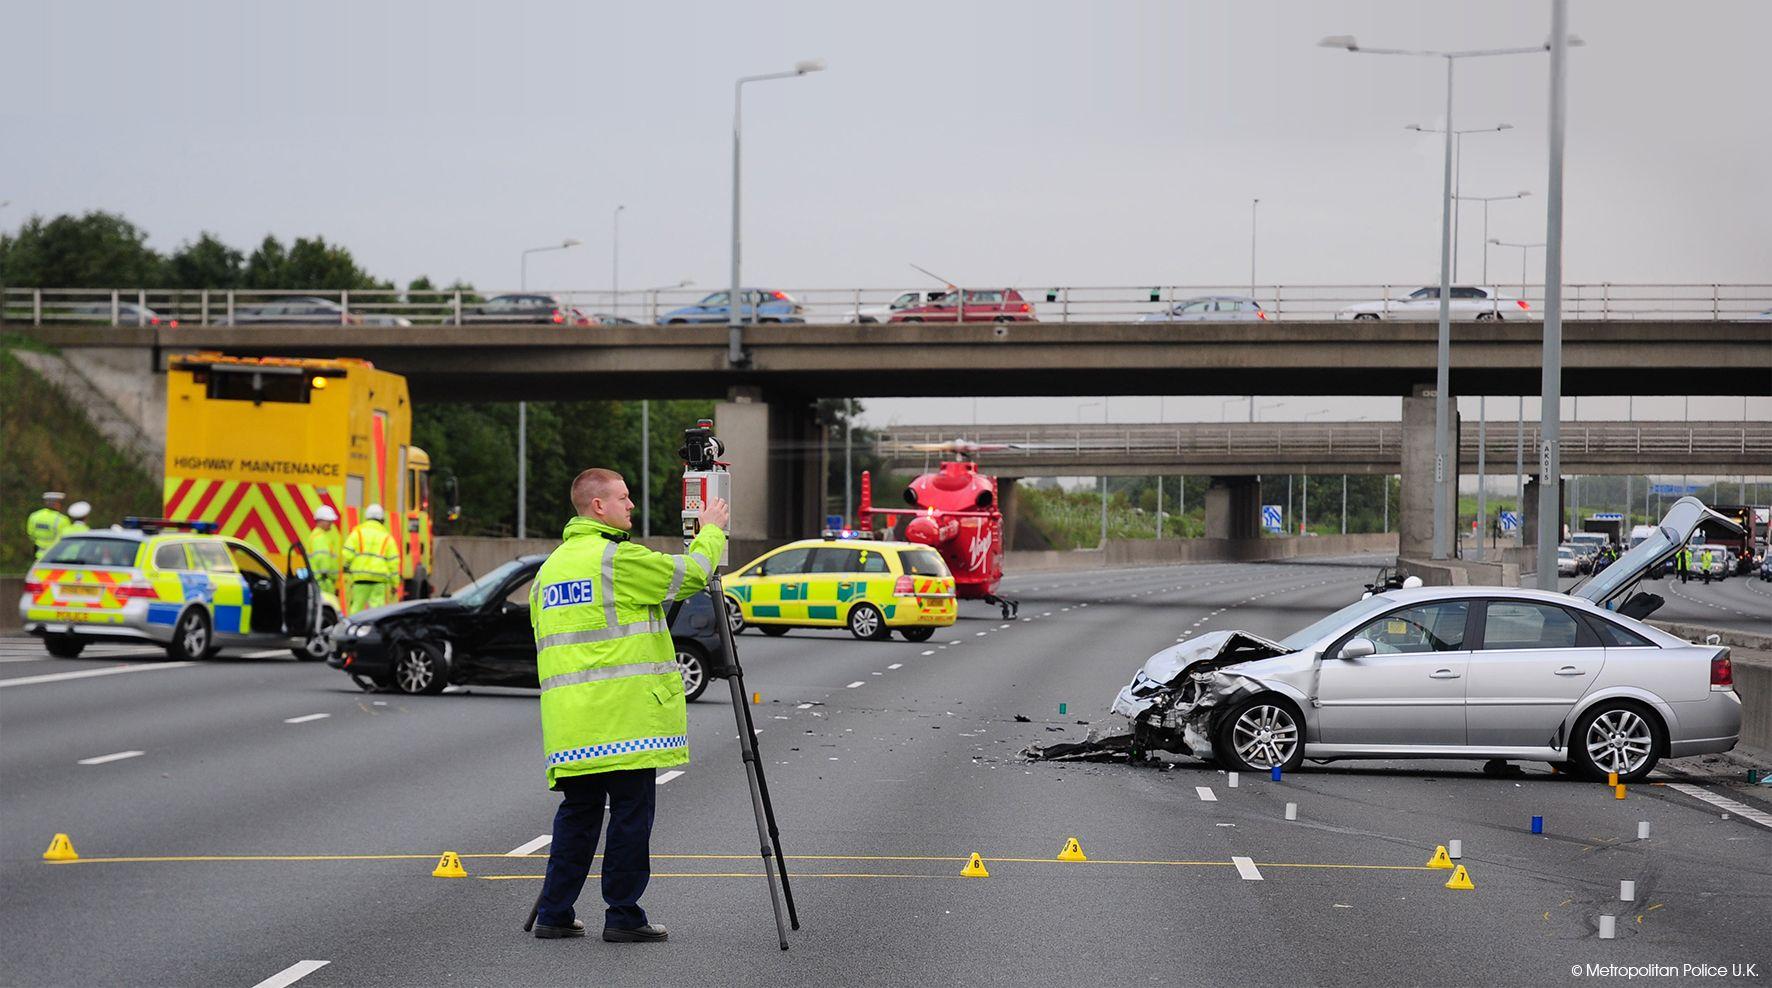 The RIEGL VZ-400i LiDAR solution for fast and efficient crash scene investigation